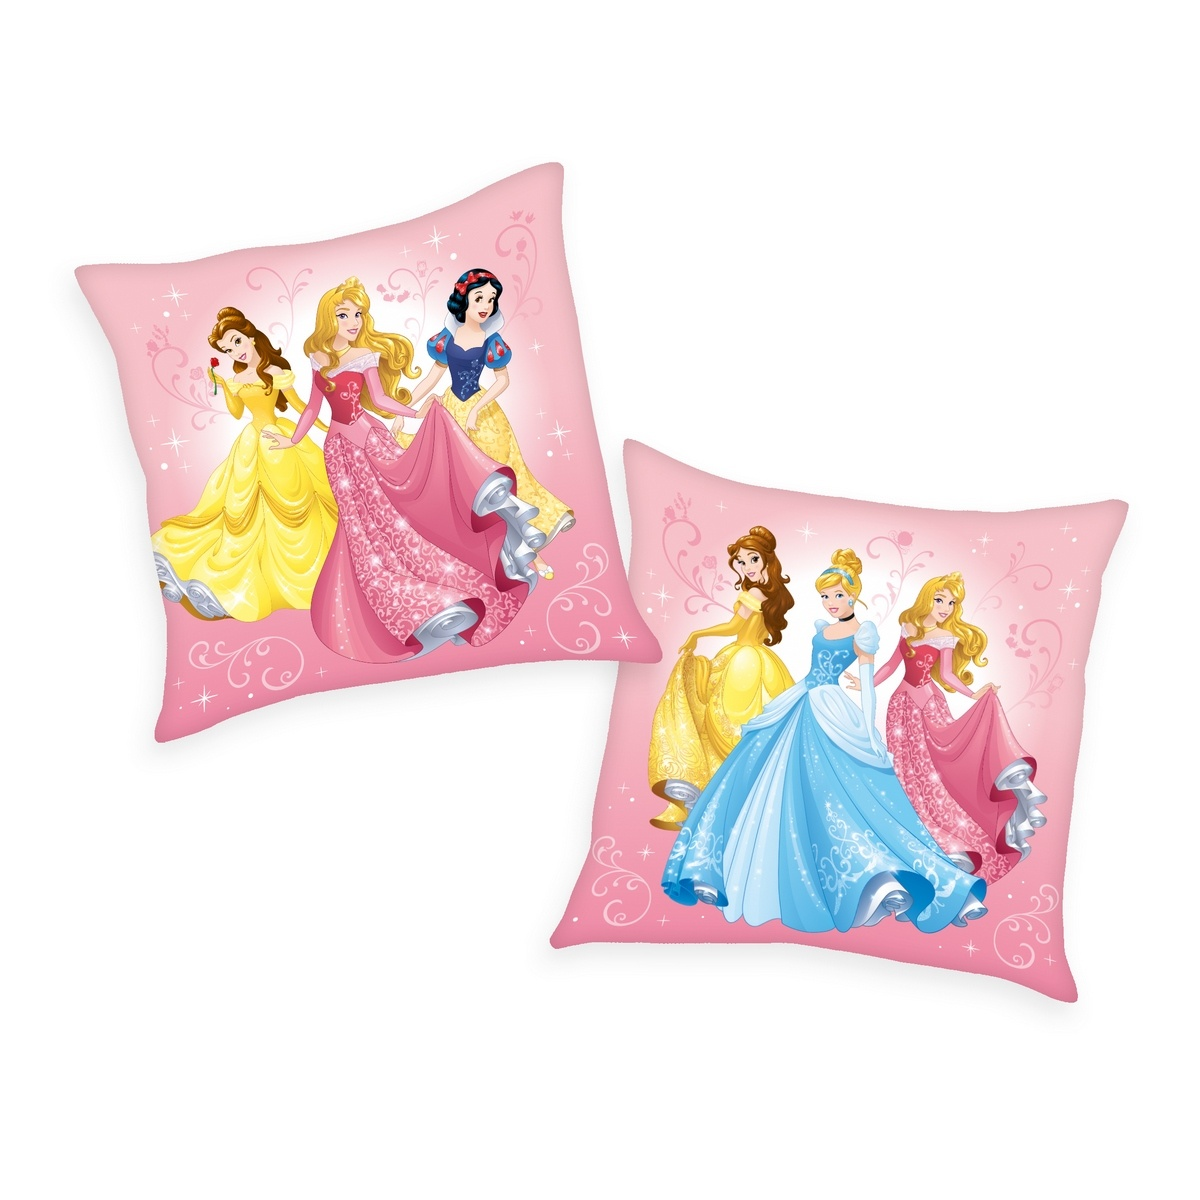 Herding Polštářek Princess pink, 40 x 40 cm